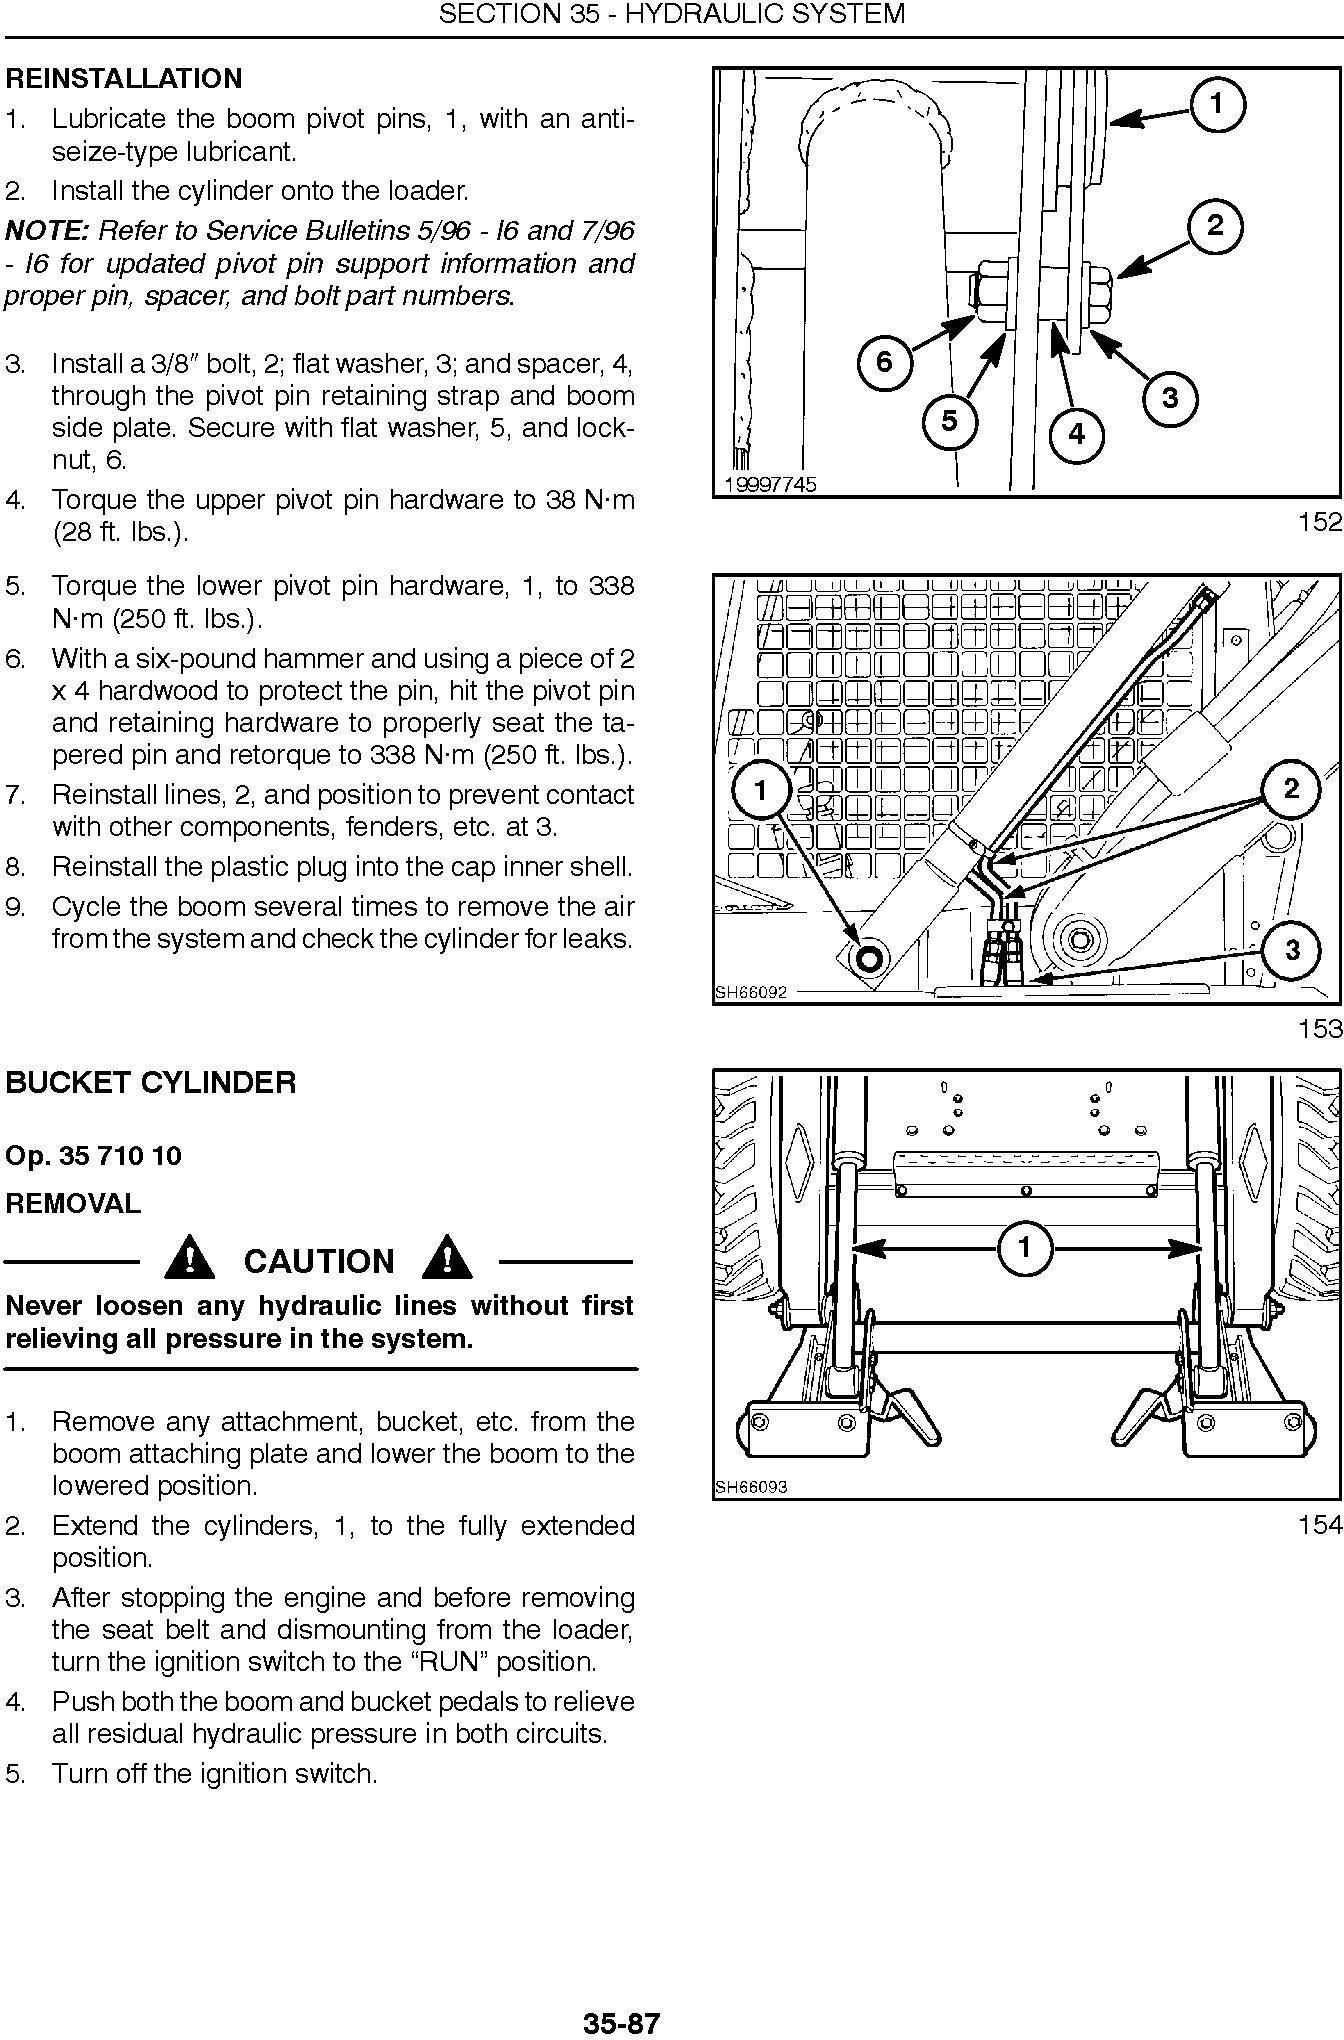 New Holland Ls170 Manual Free